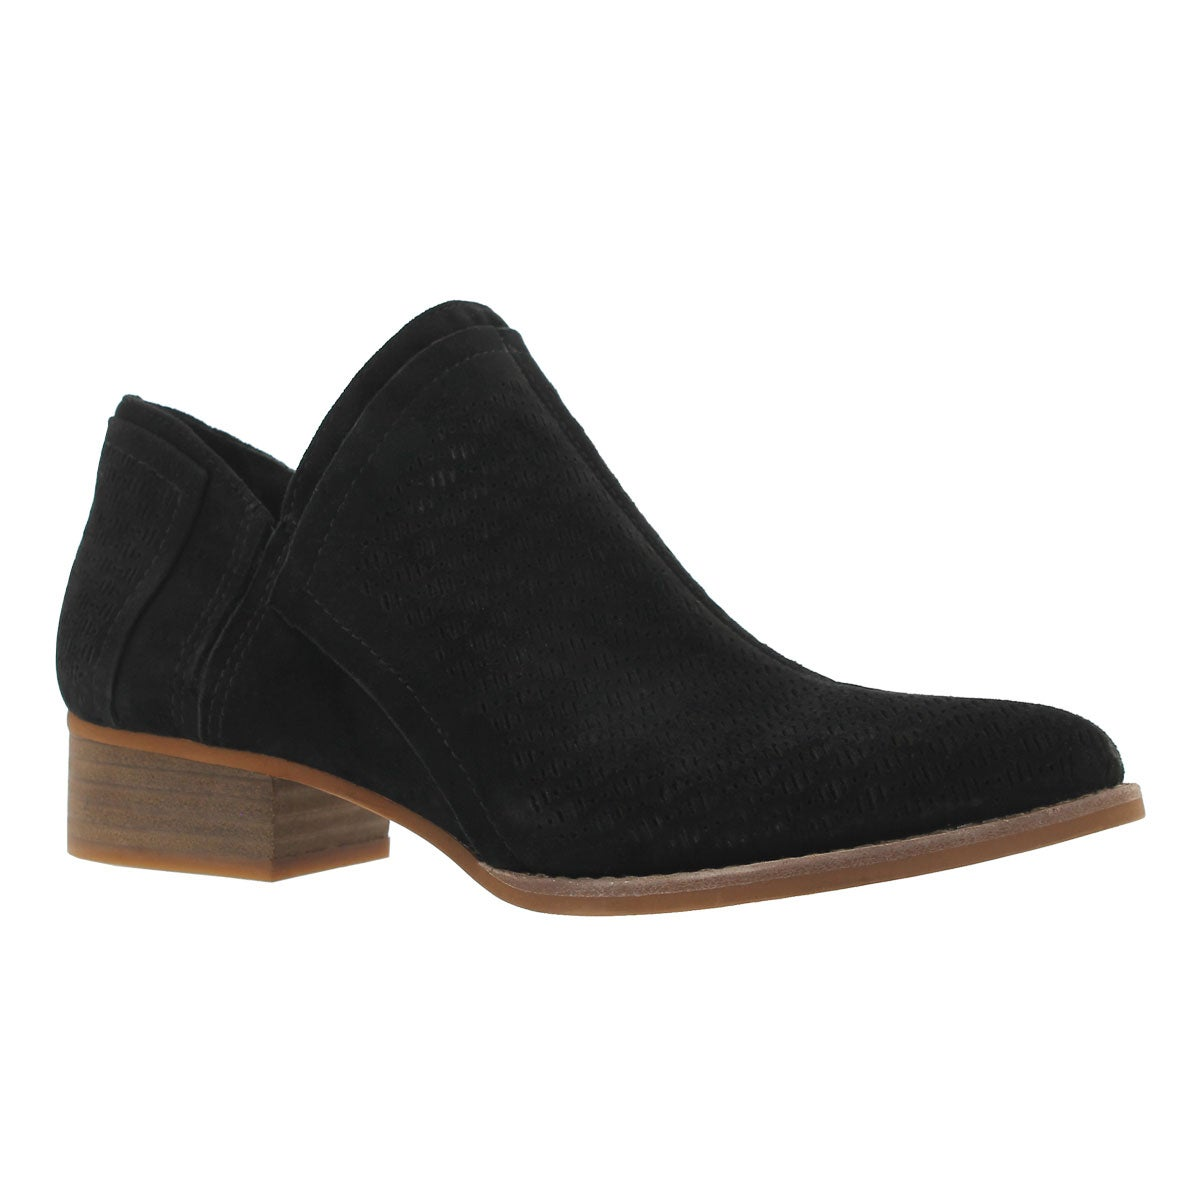 Women's CLORIEEA black slip on casual booties